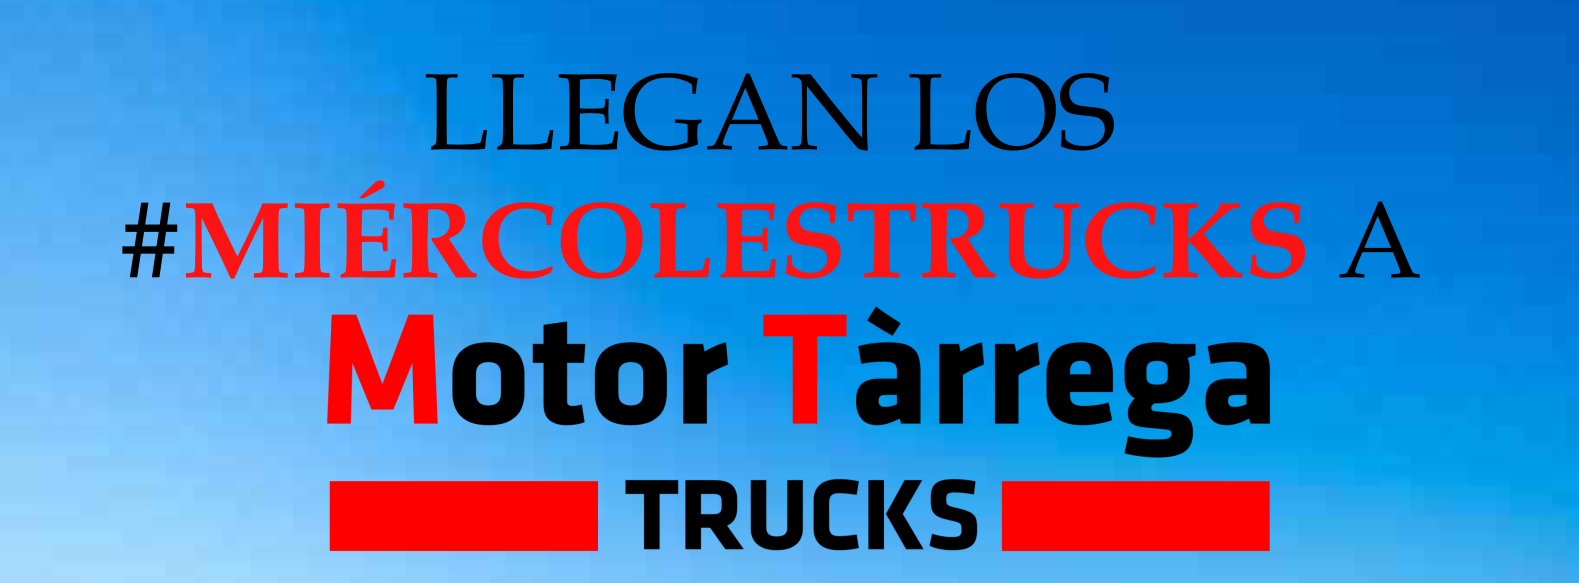 Miercoles trucks